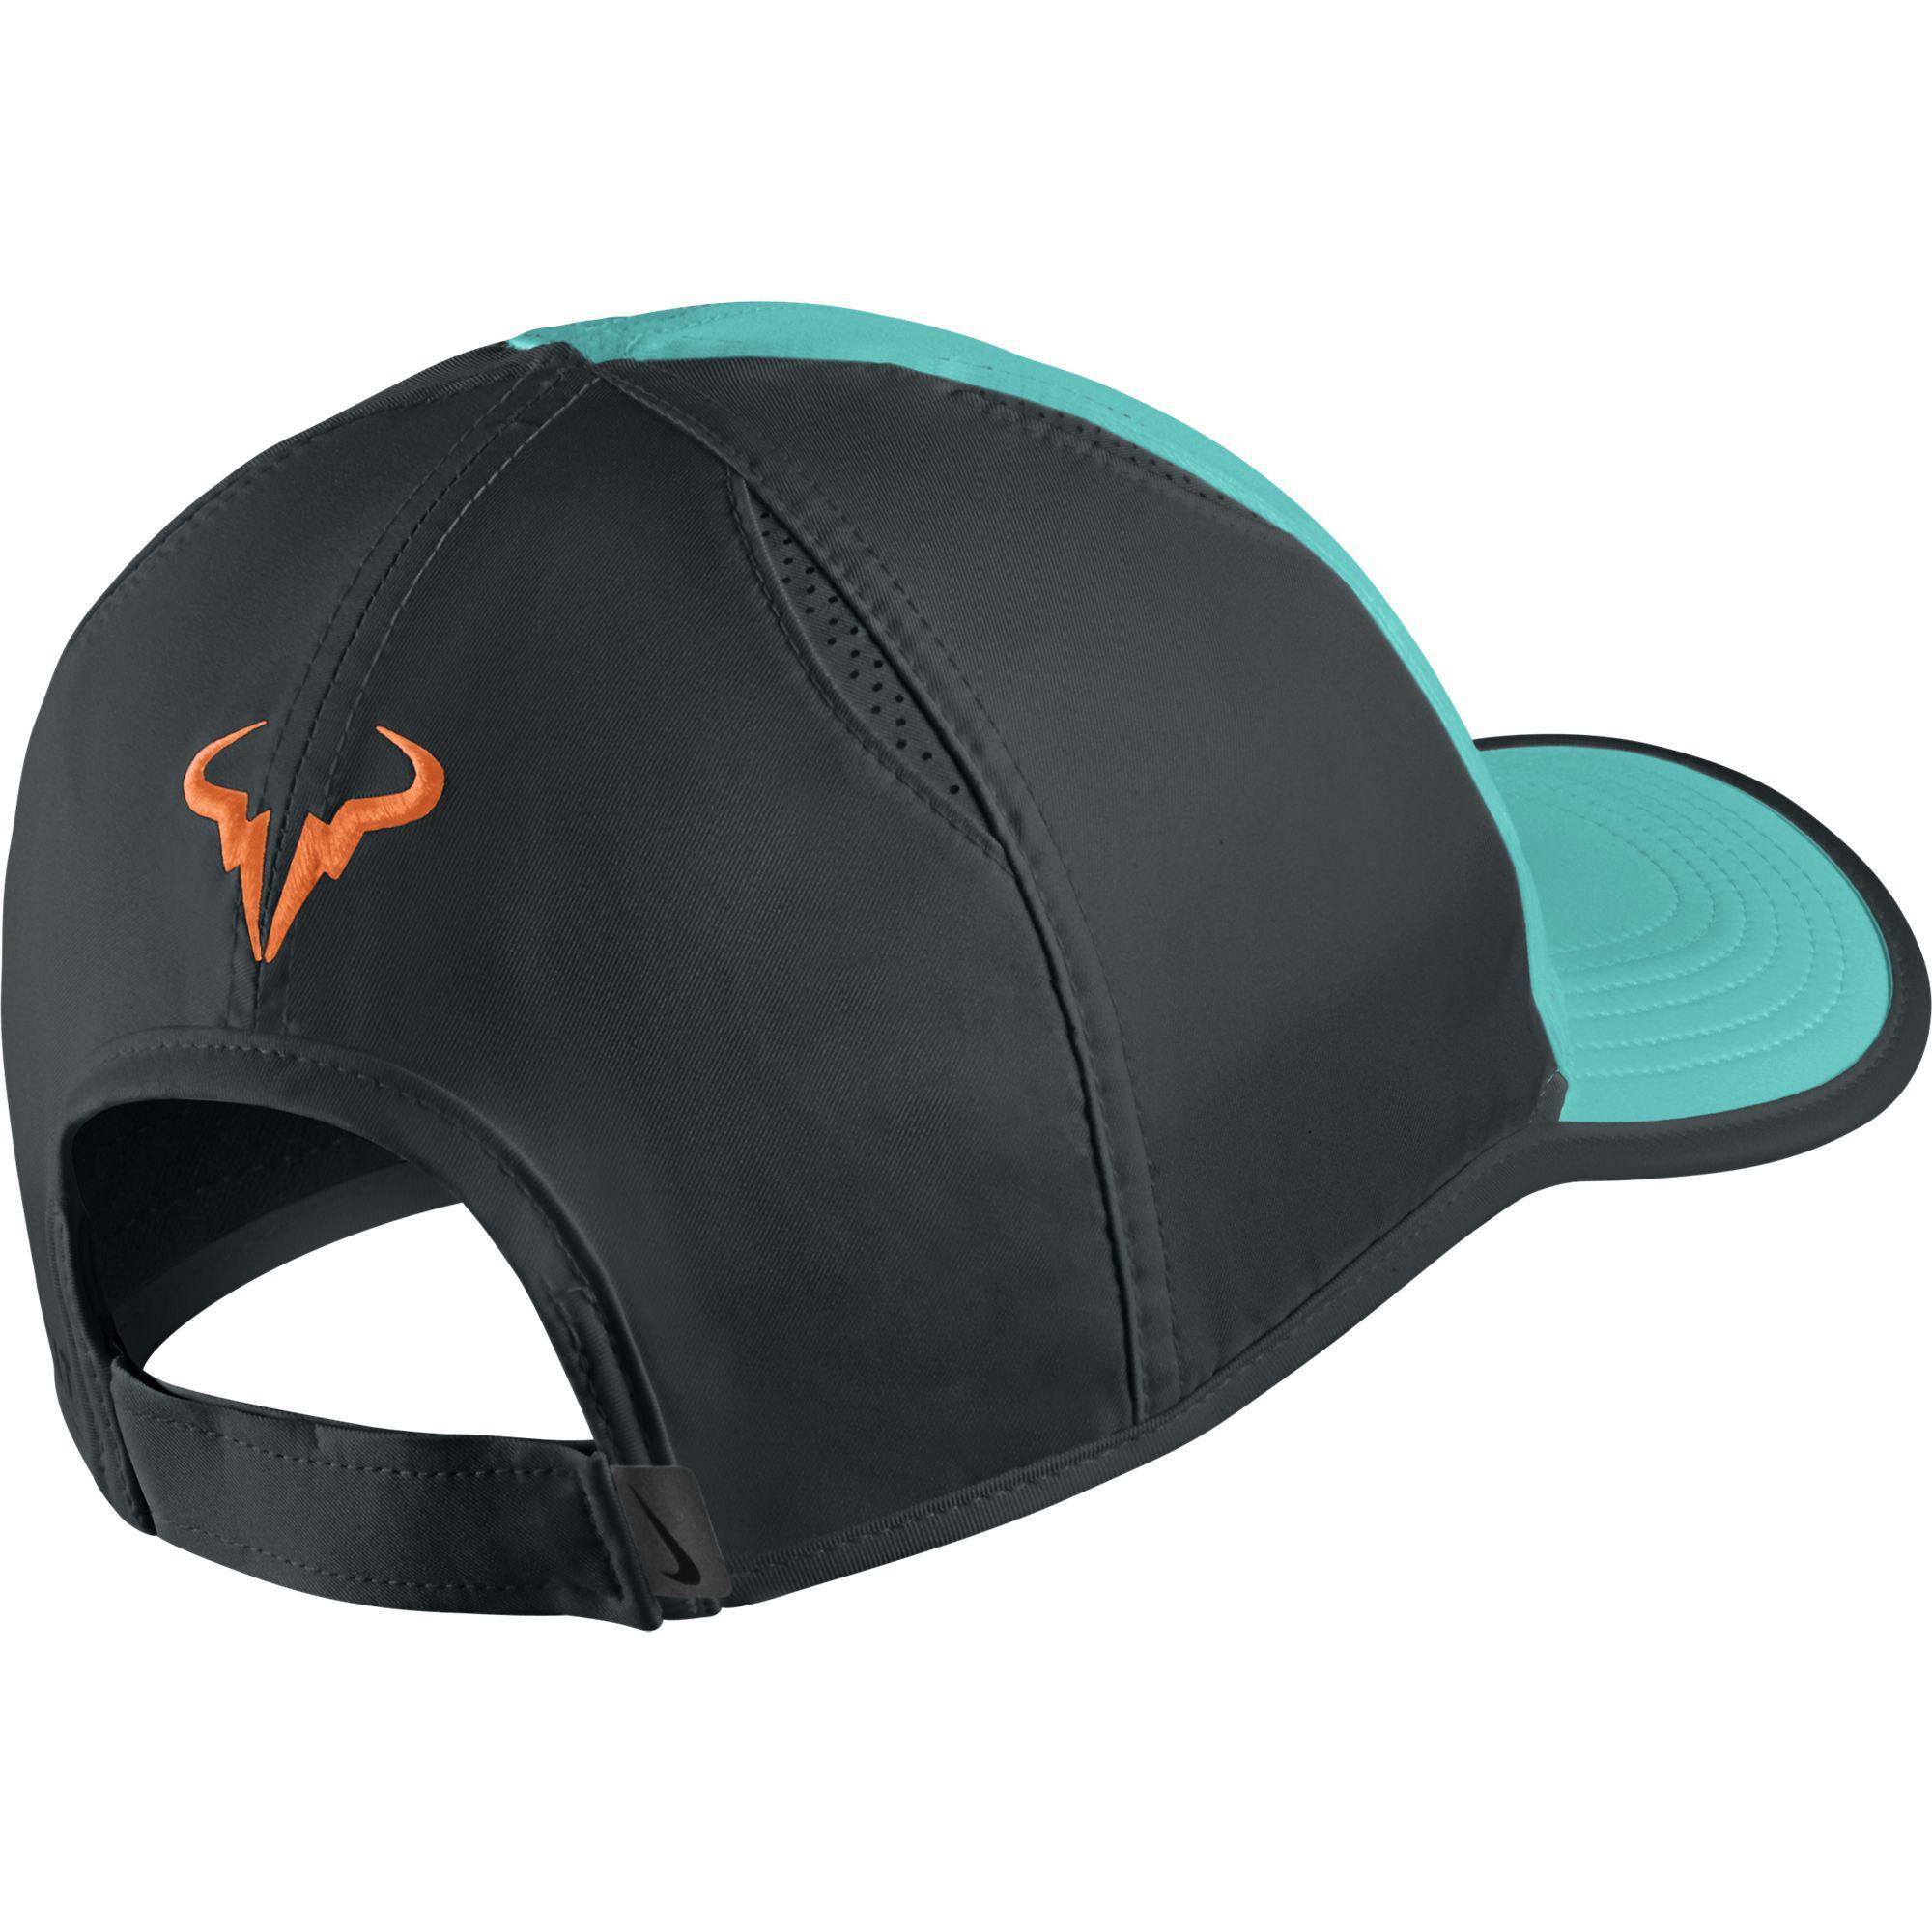 52ac42a5616ac ... bull logo dri fit featherlite tennis hat sonic armory blue 398224 6c329  96734; cheap nike premier rafa feather light cap blue d2f40 3ddcc